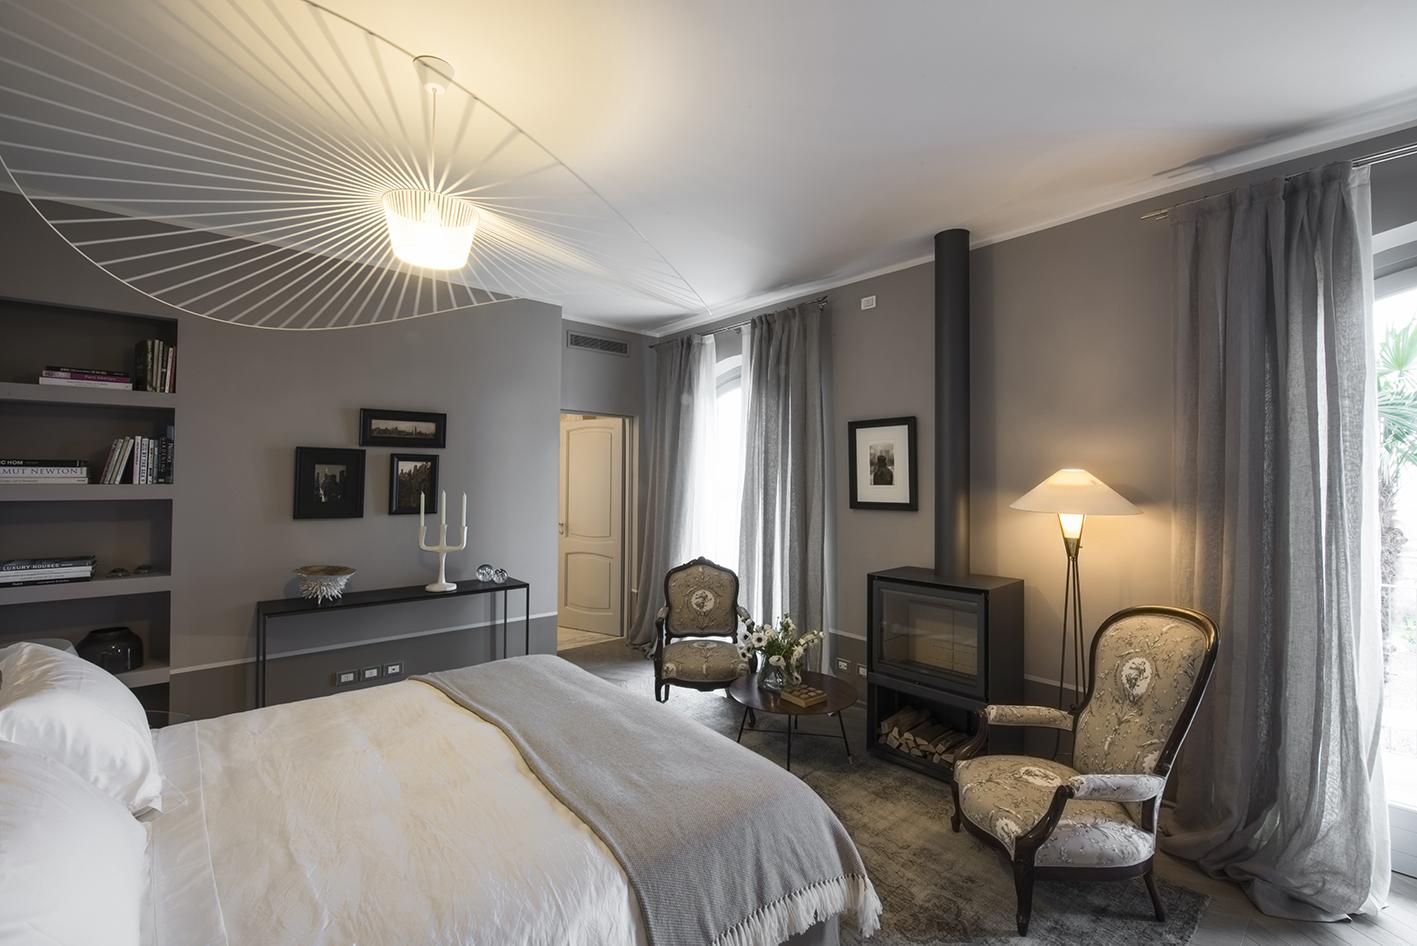 An image of the Libeccio suite in Villa Gilda.